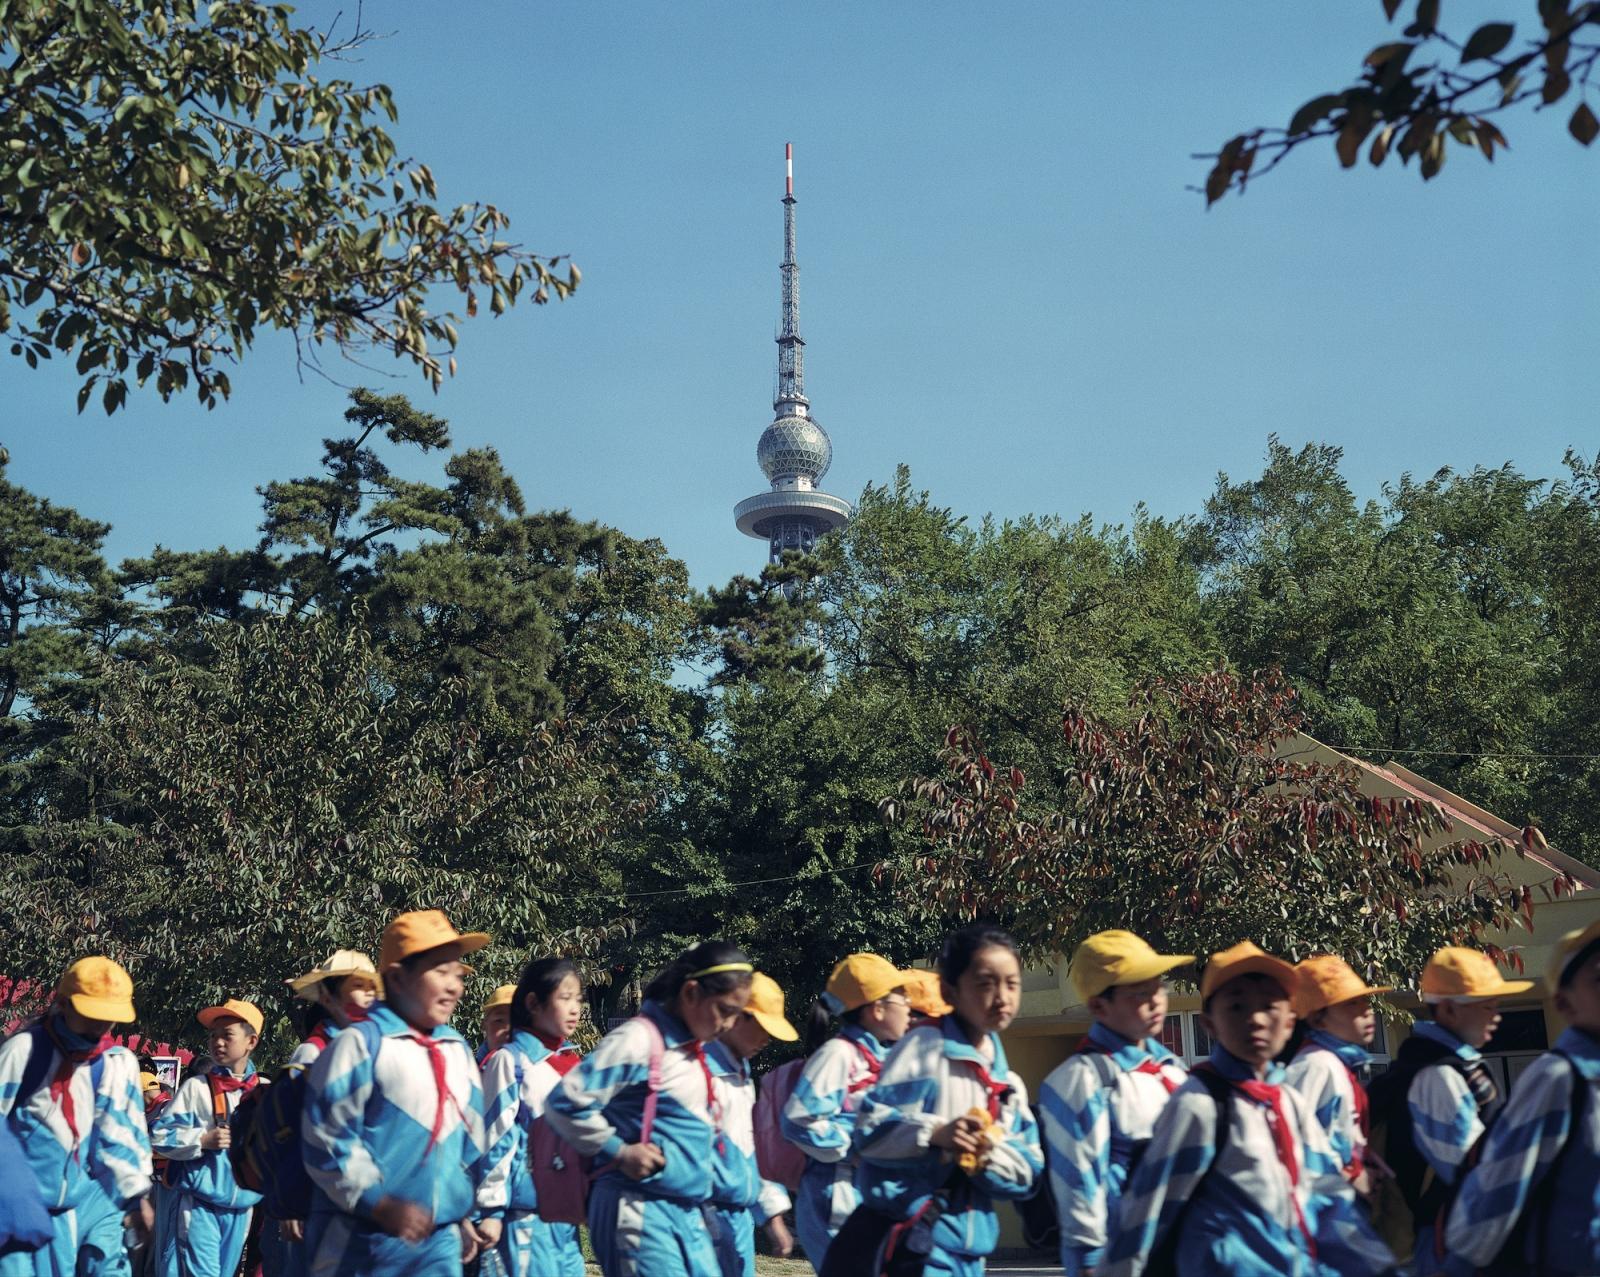 "Qingdao, 2000 2000 Archival Pigment Inkjet Print 30"" x 37.5"""